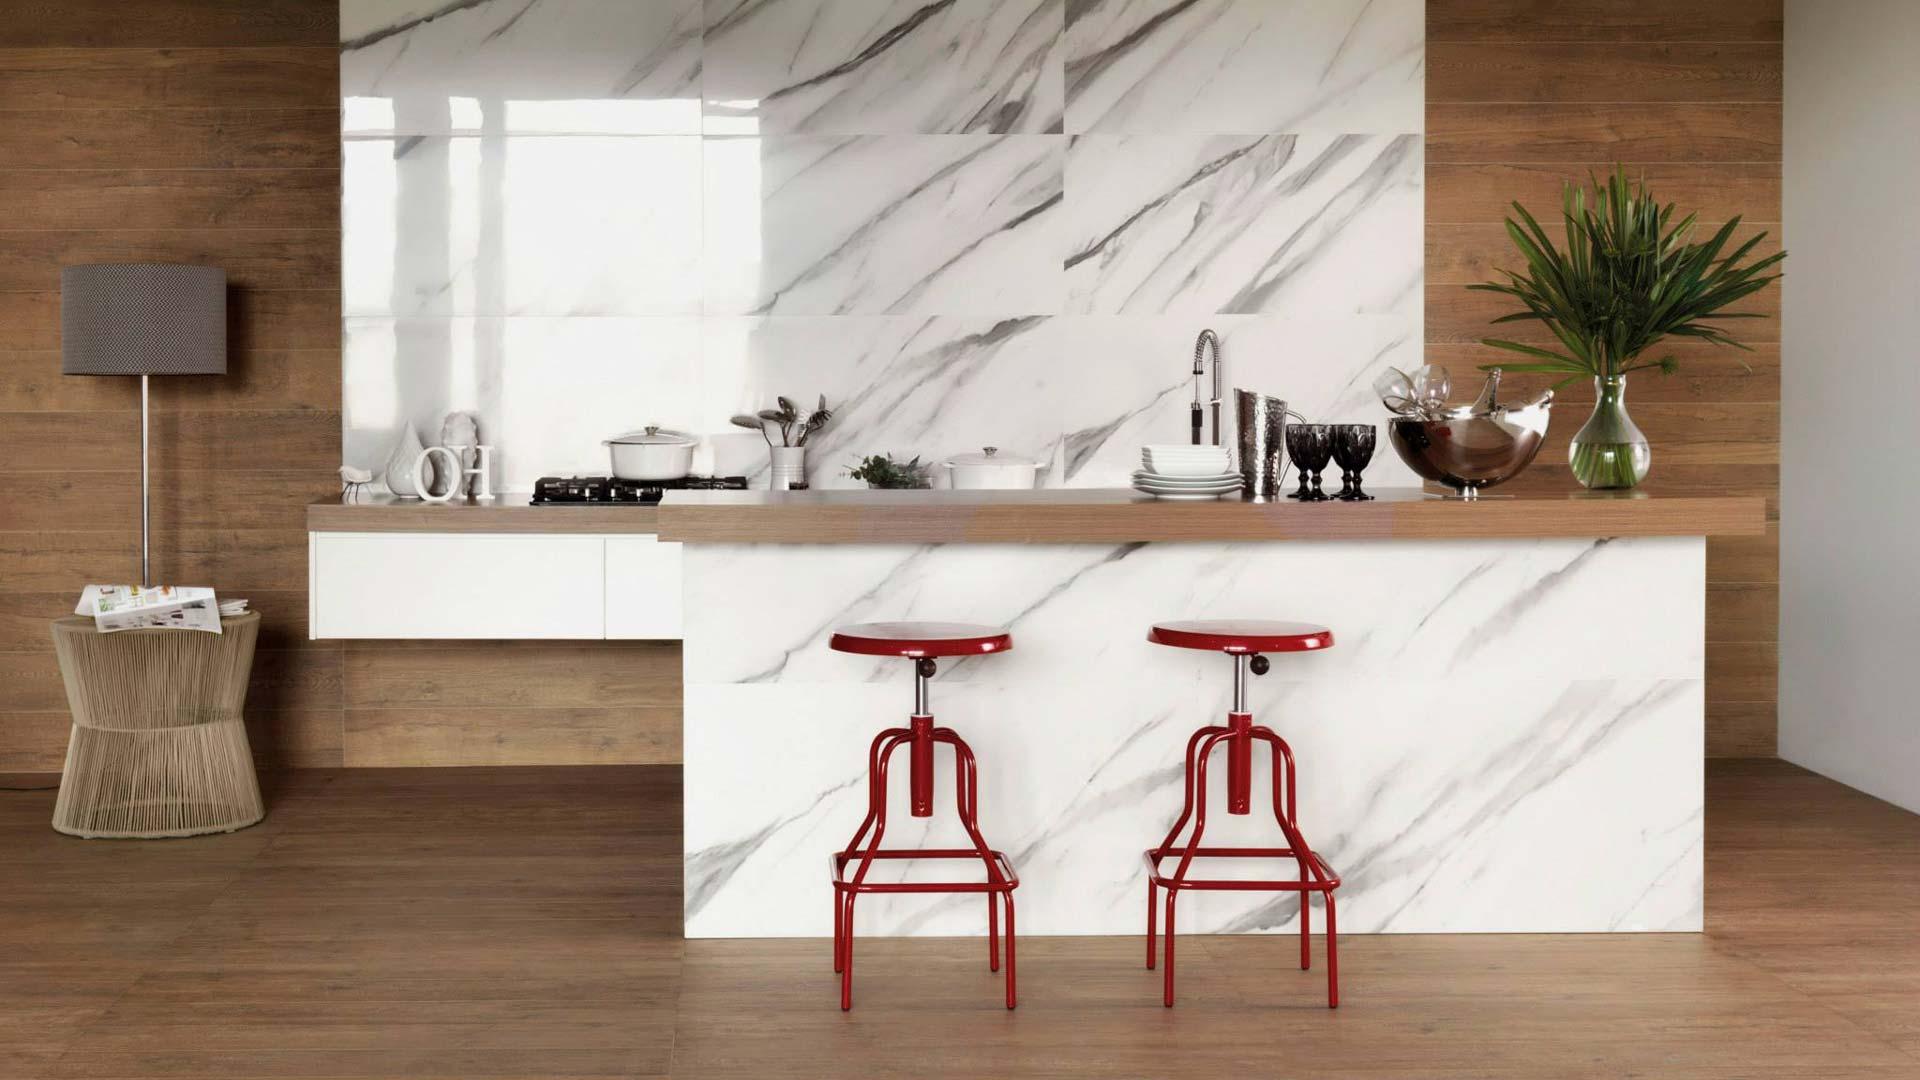 Contemporary Tile Interior Design Inspiration Lookbook Kitchen